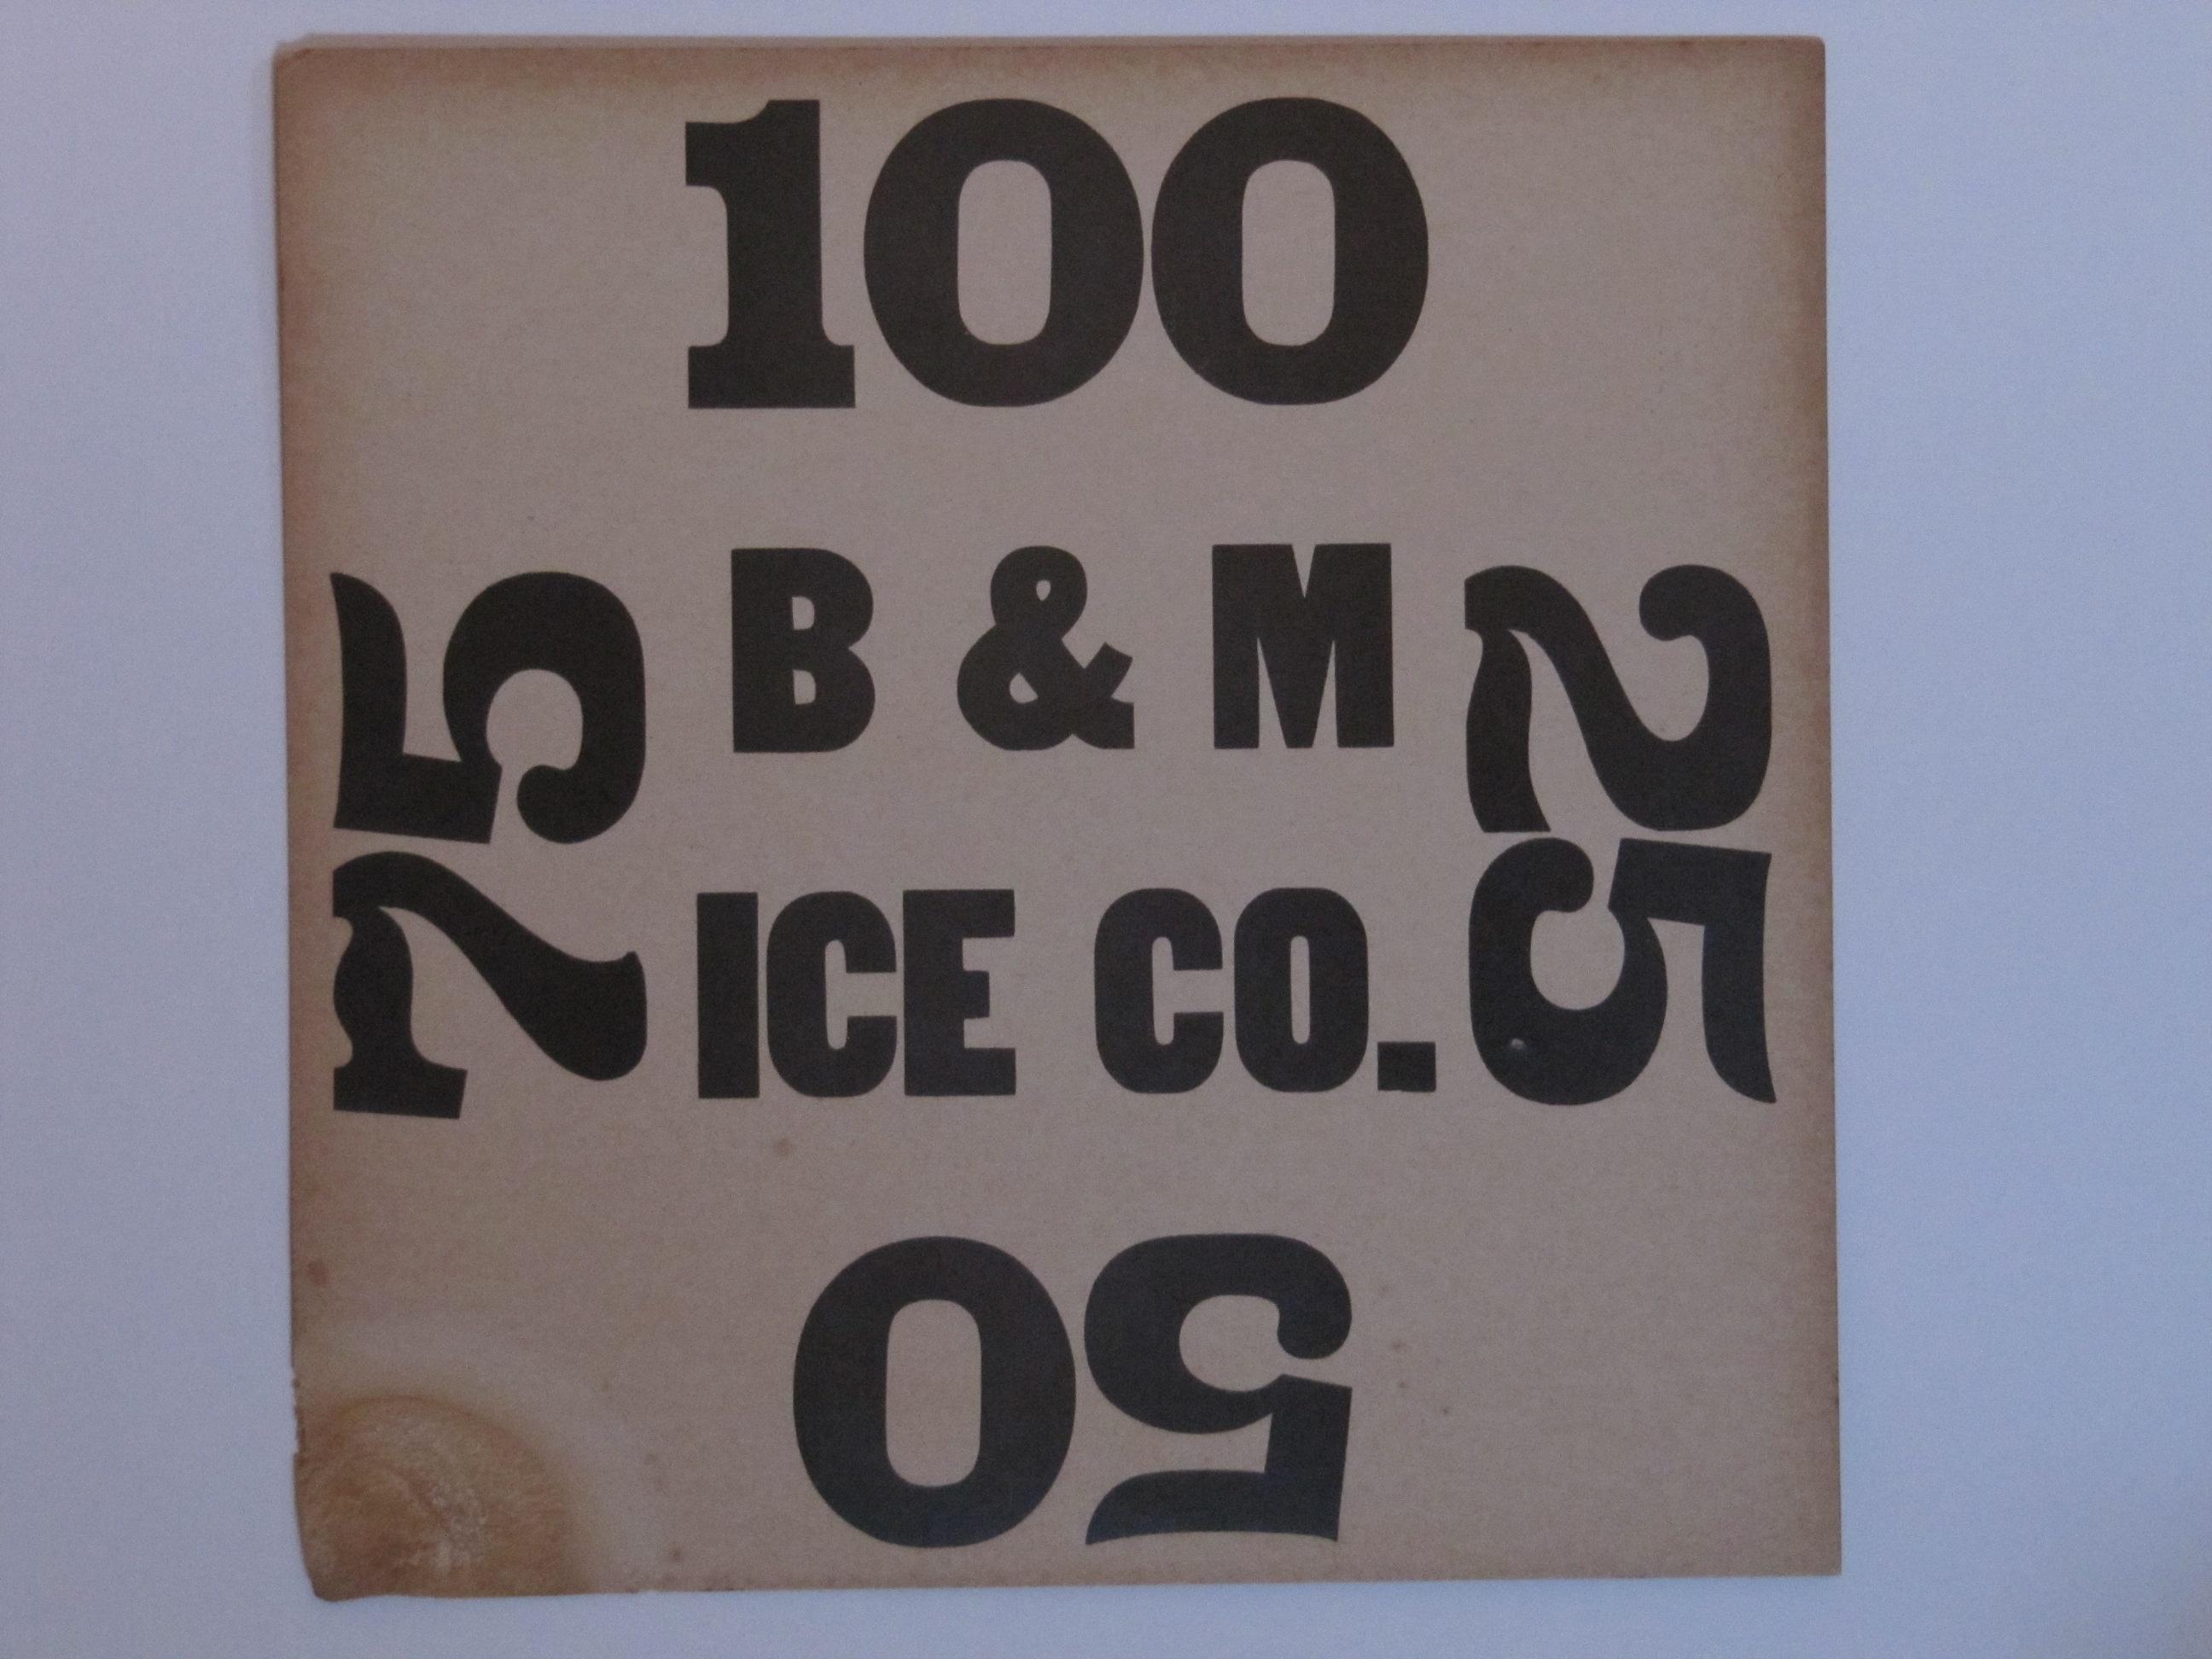 B&M Ice